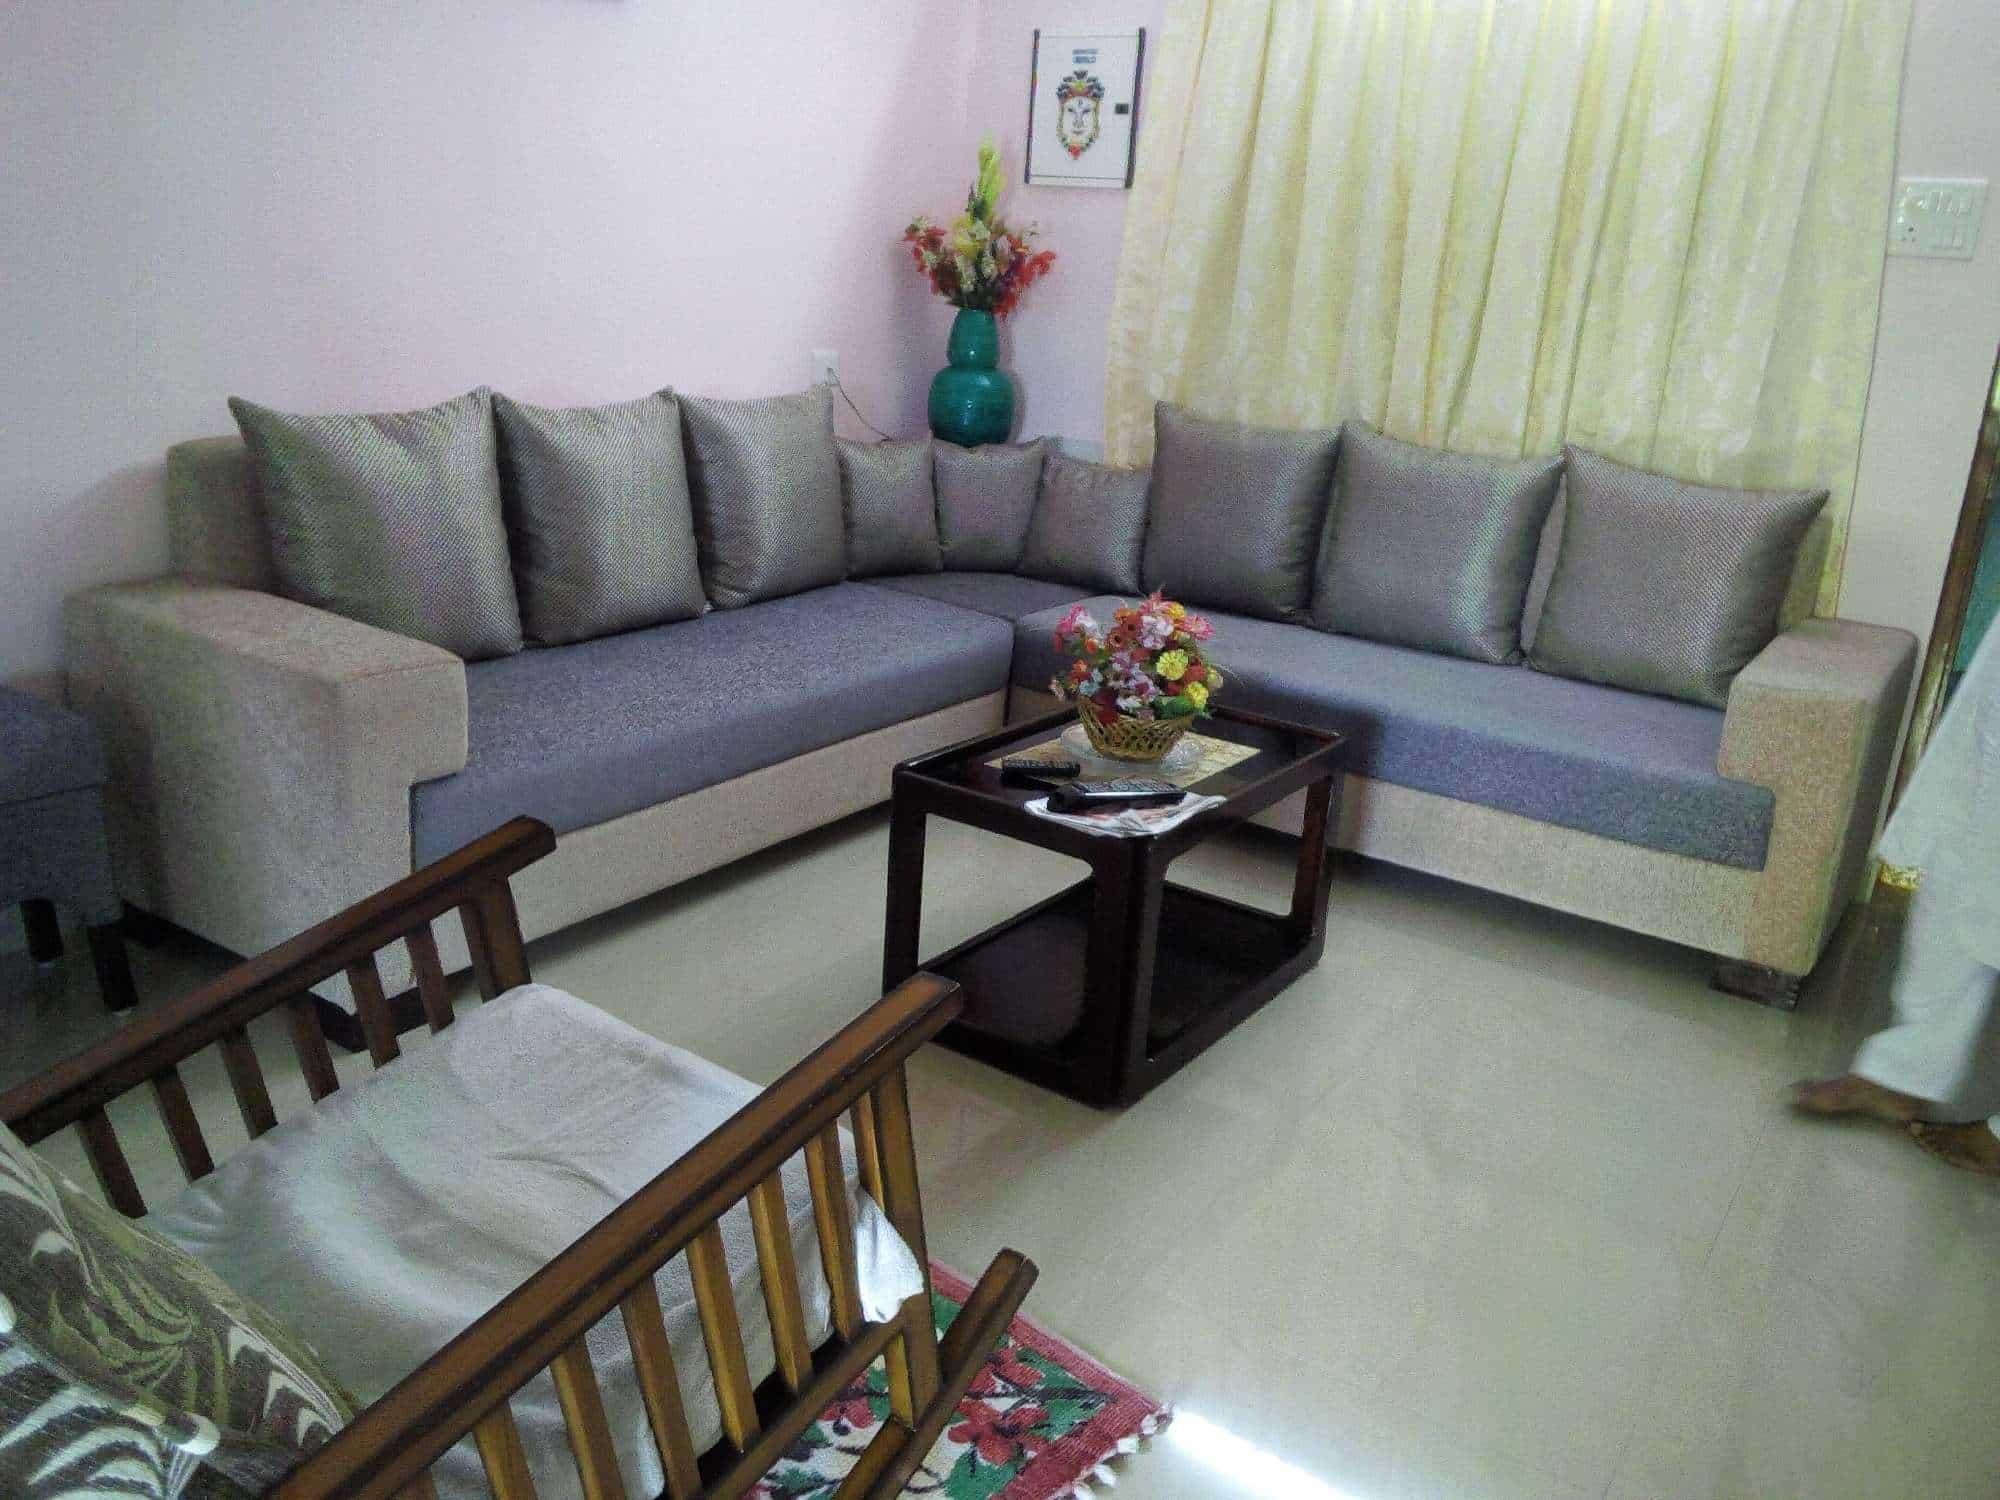 sofaworks reading number stressless sofa manual gouse works set repair services in rajahmundry justdial